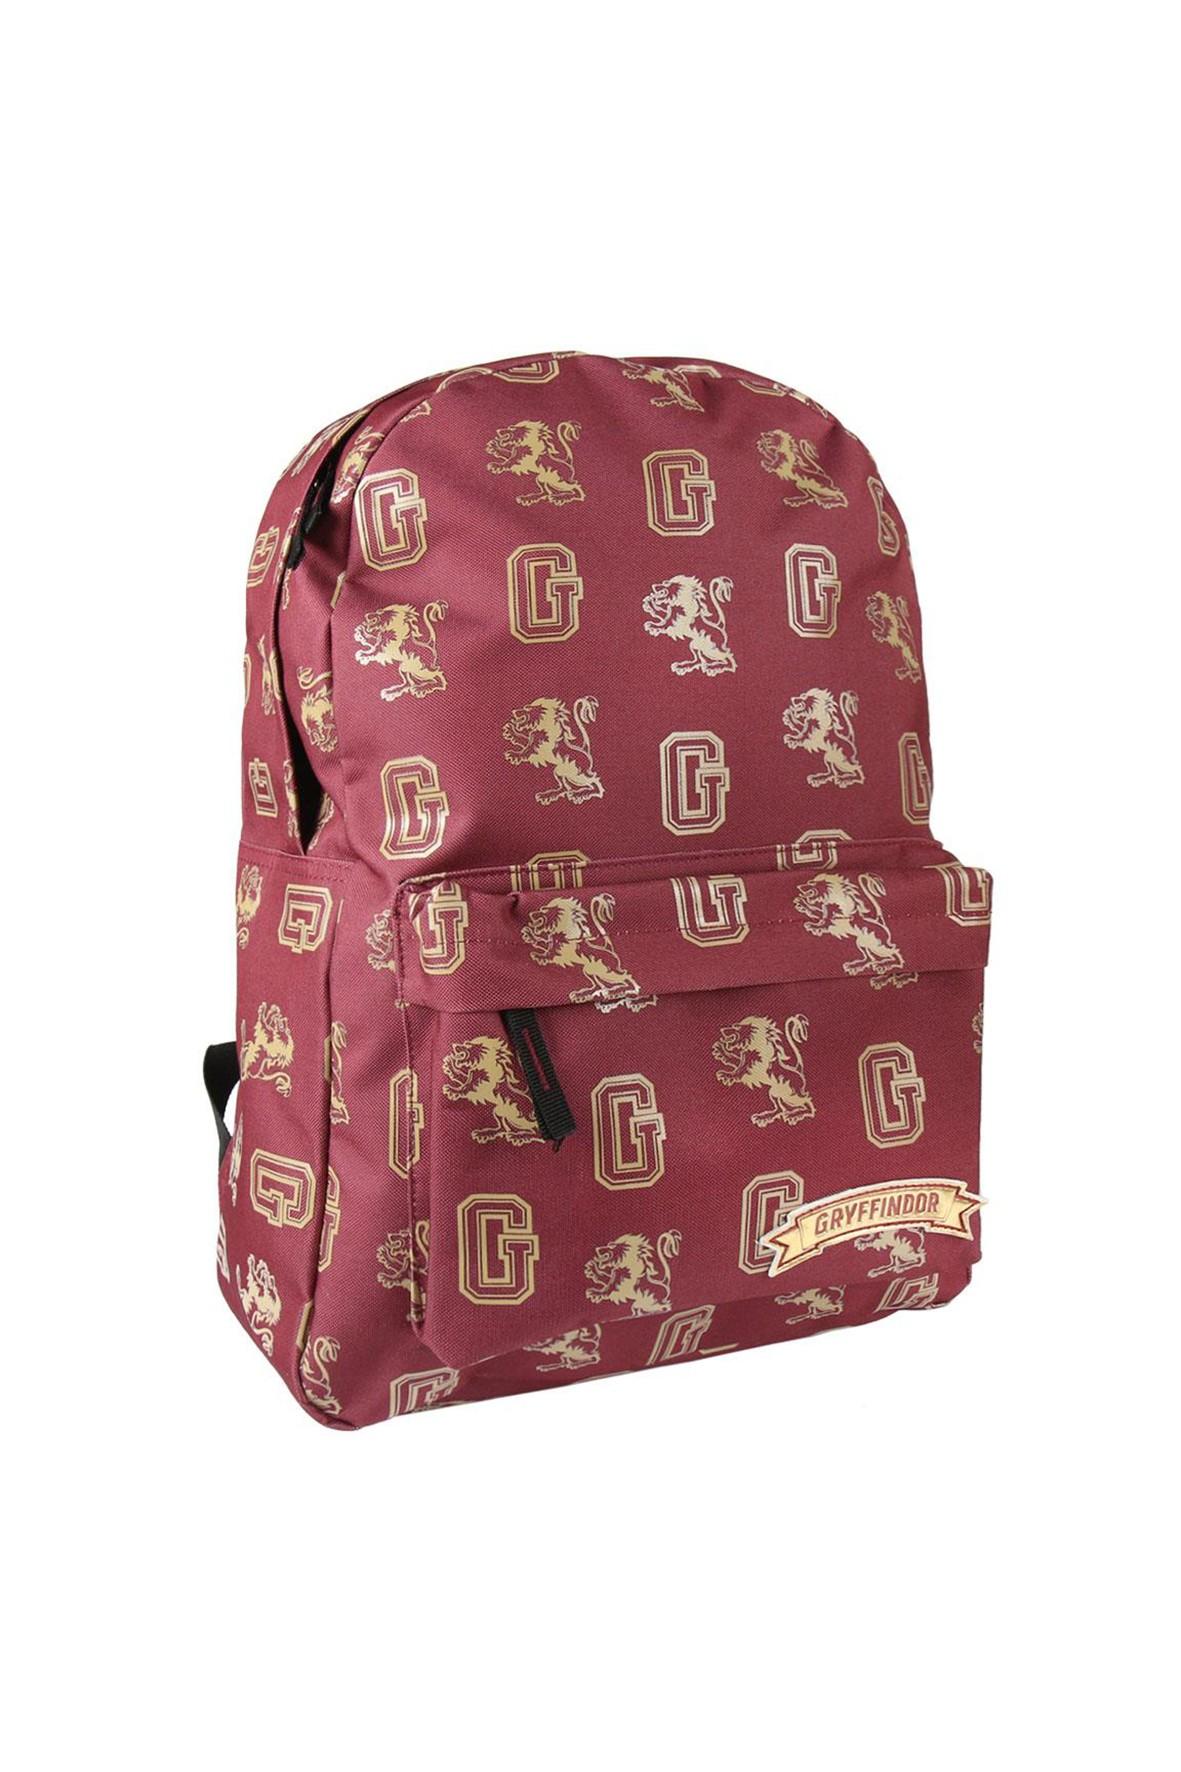 Plecak dla dziecka Harry Potter